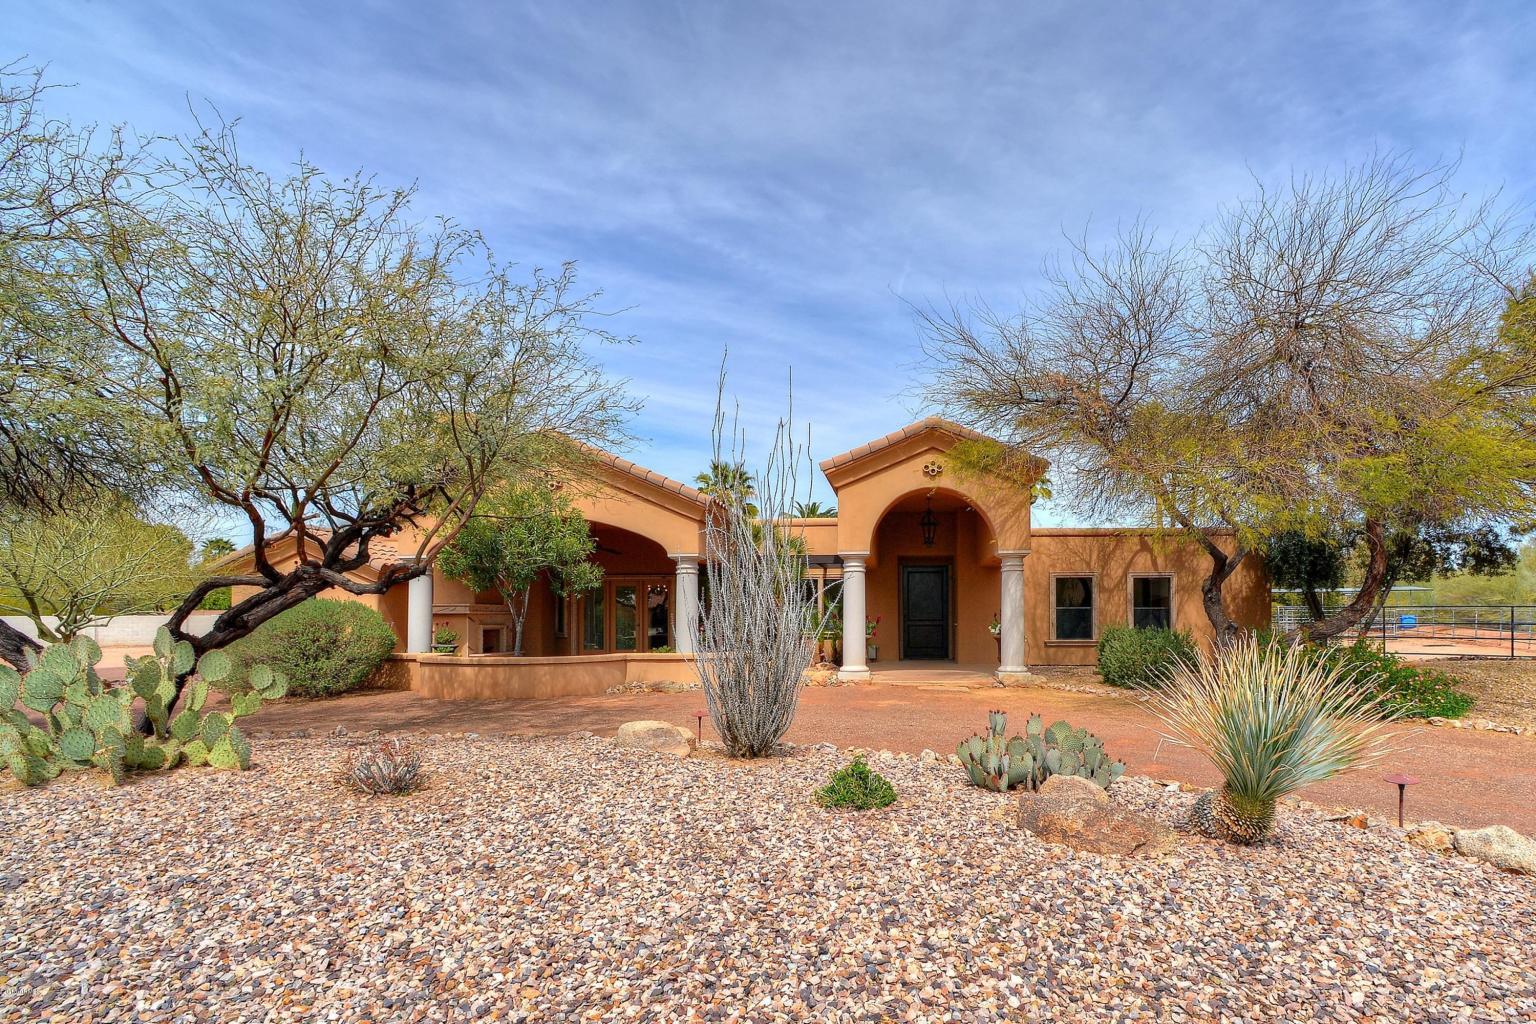 8116 E Gray Rd, Scottsdale | $625,000